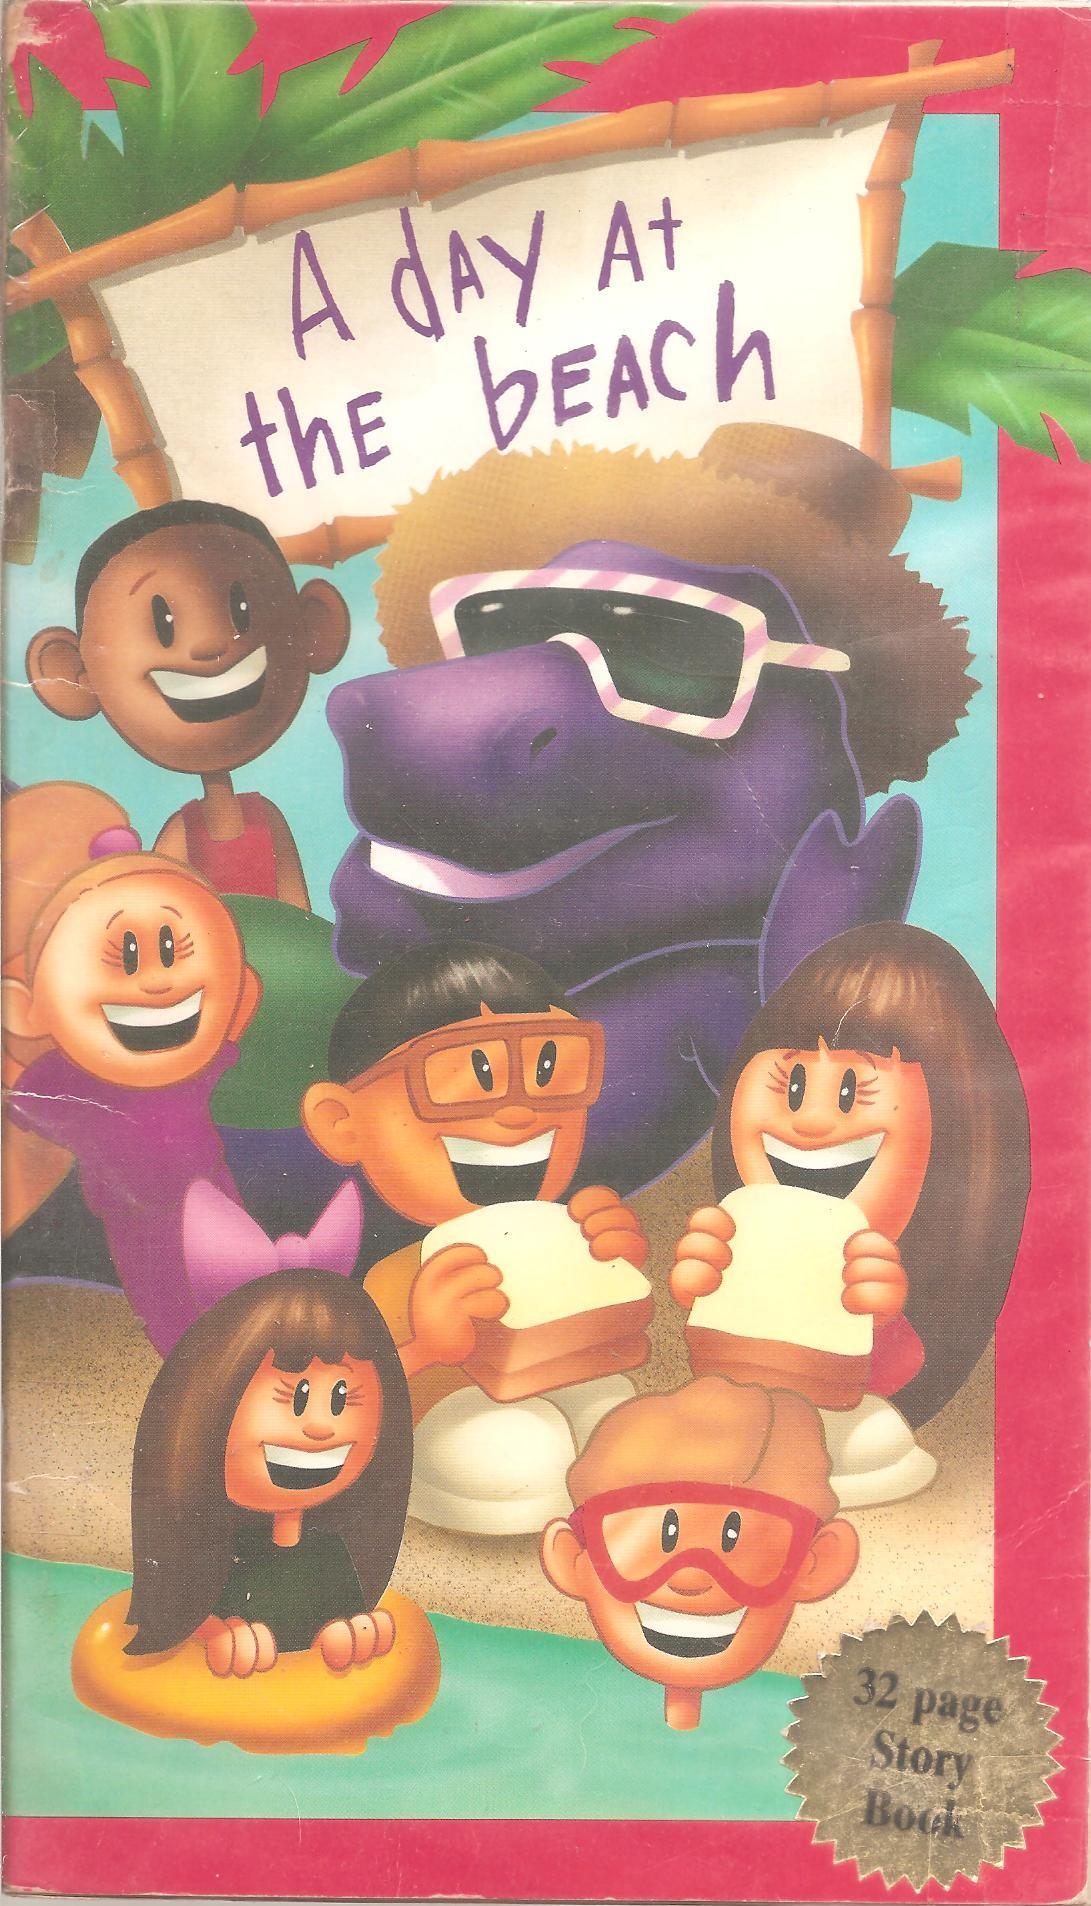 Barney And The Backyard Gang I Love You barney & friends images barney and the backyard gang: a day at the